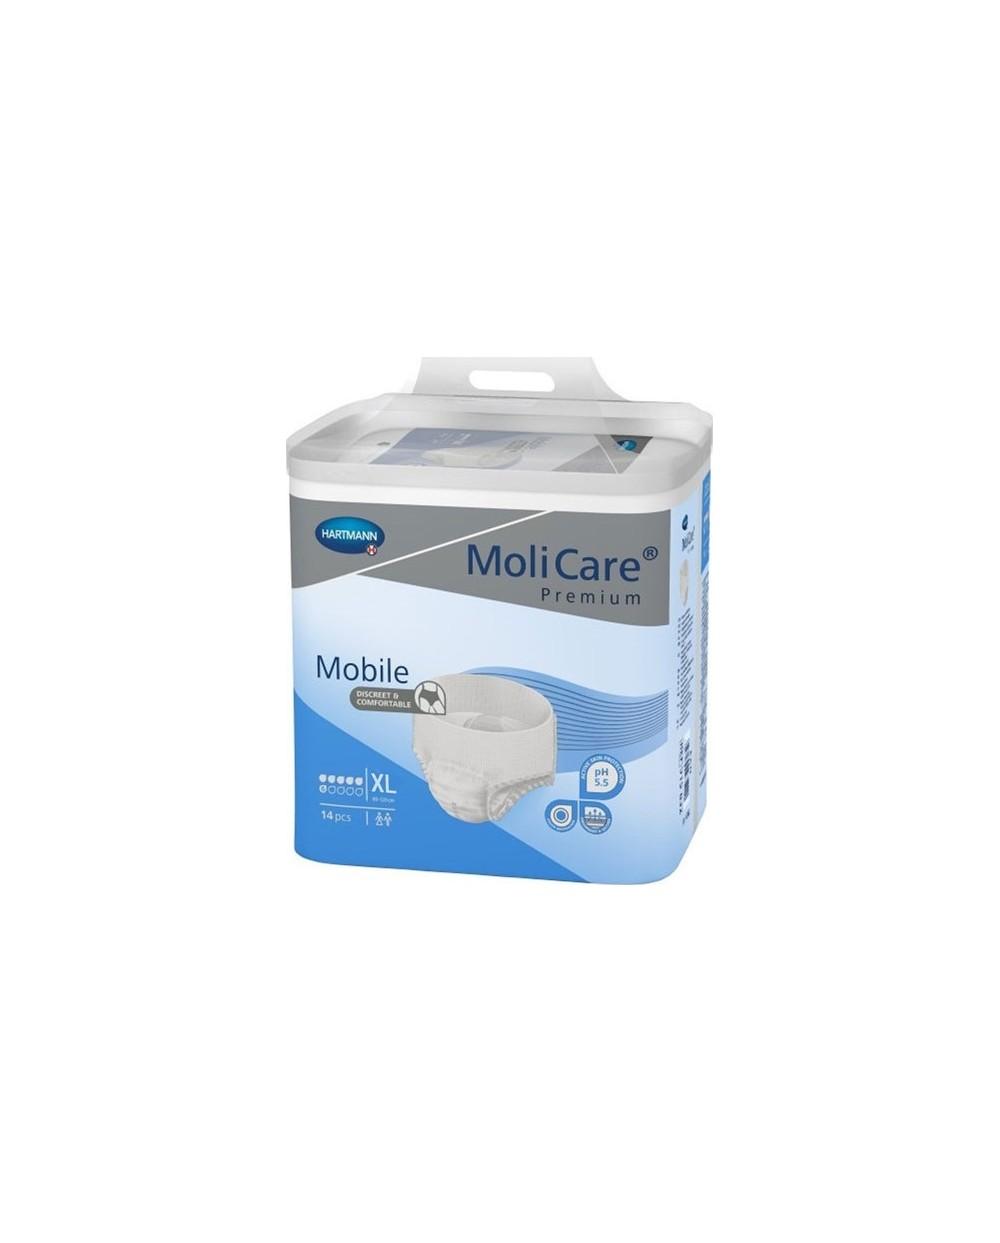 Hartmann MoliCare Mobile 6 gouttes XL- 14 protections